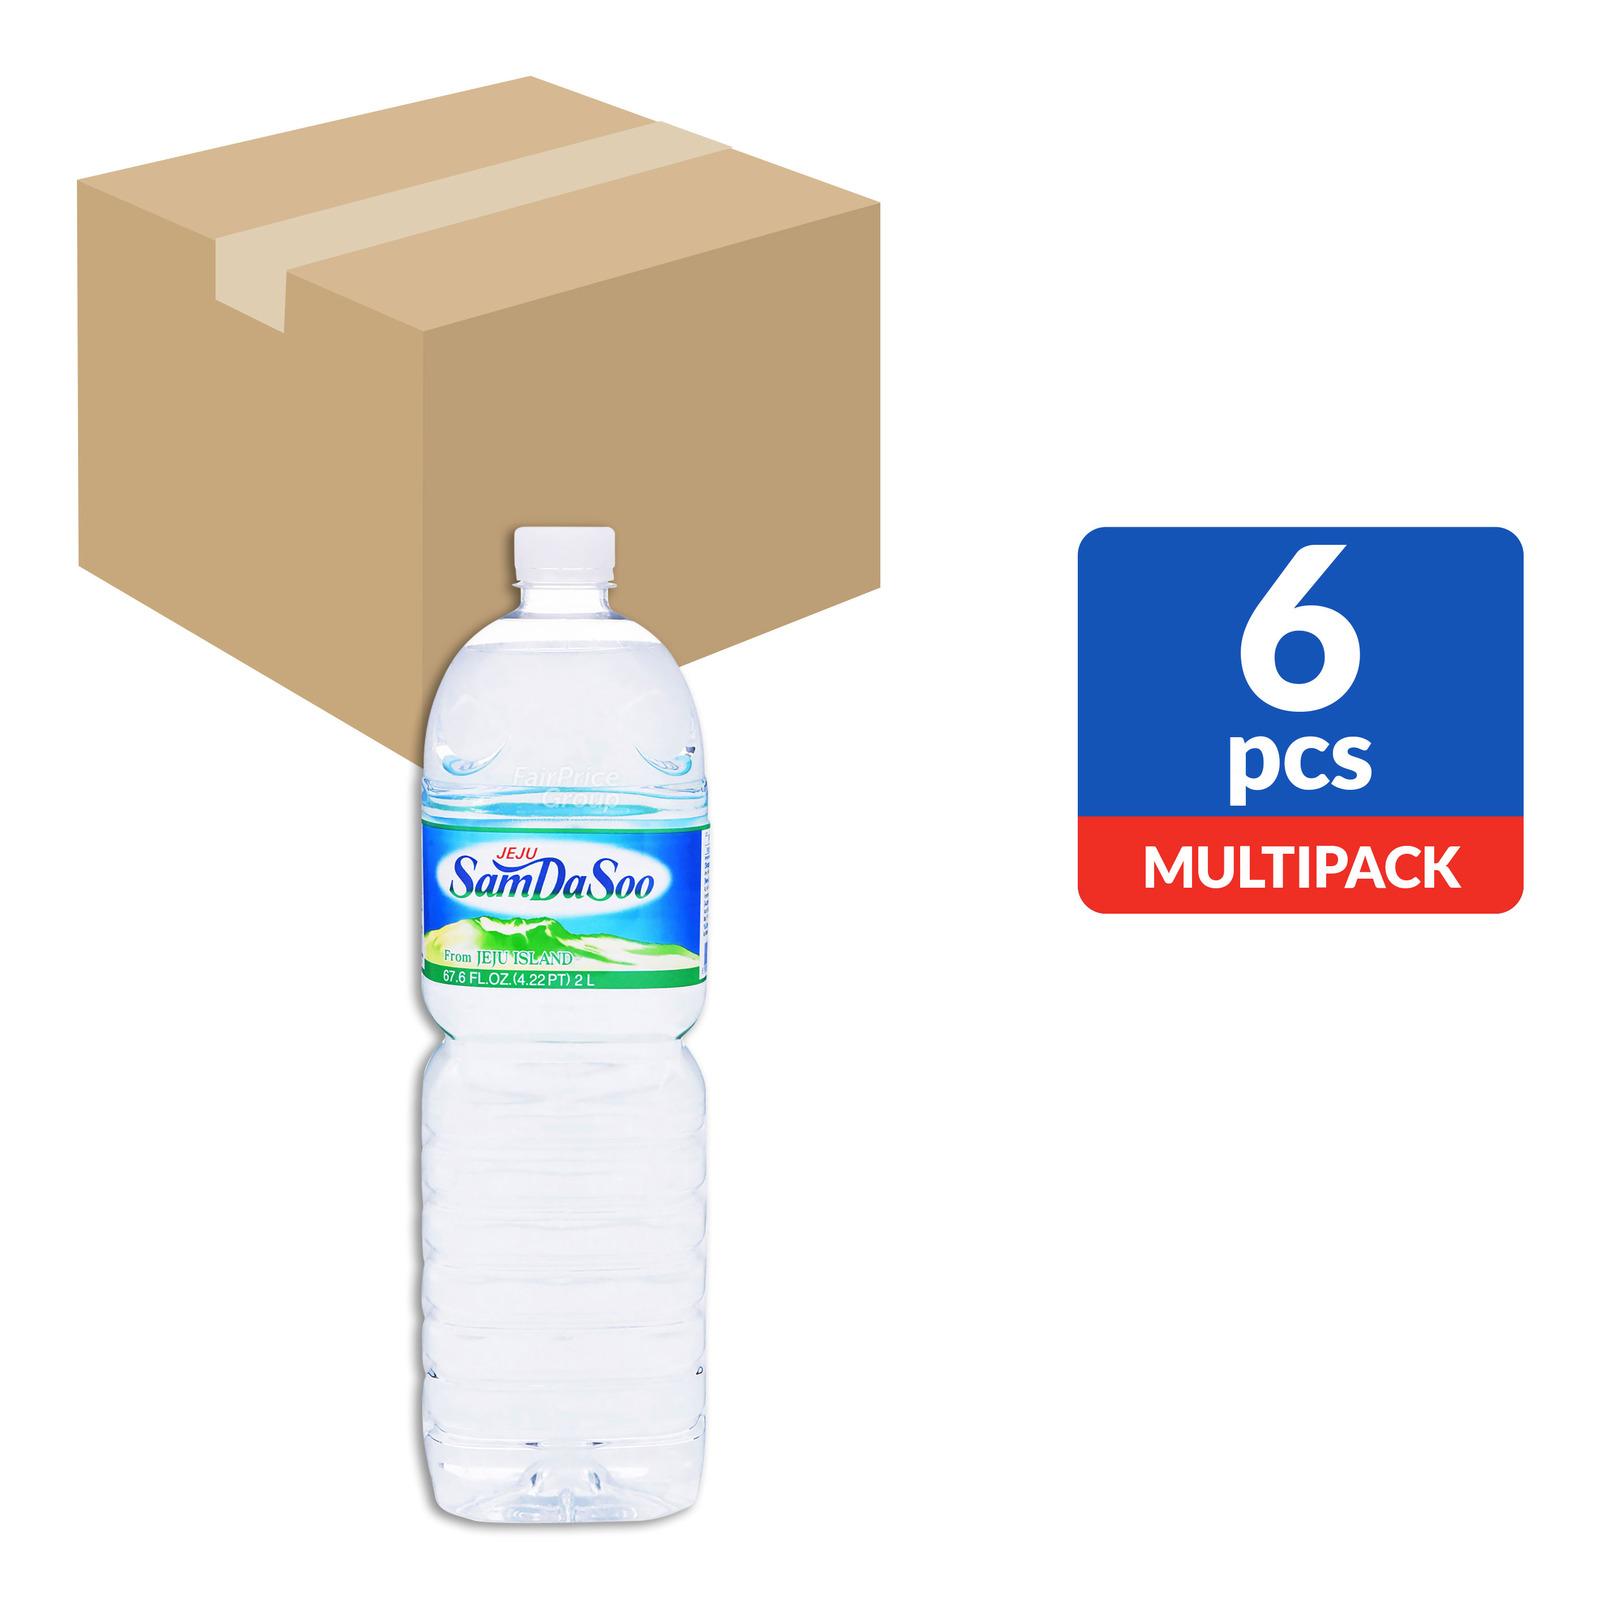 Jeju SamDaSoo Mineral Bottle Water